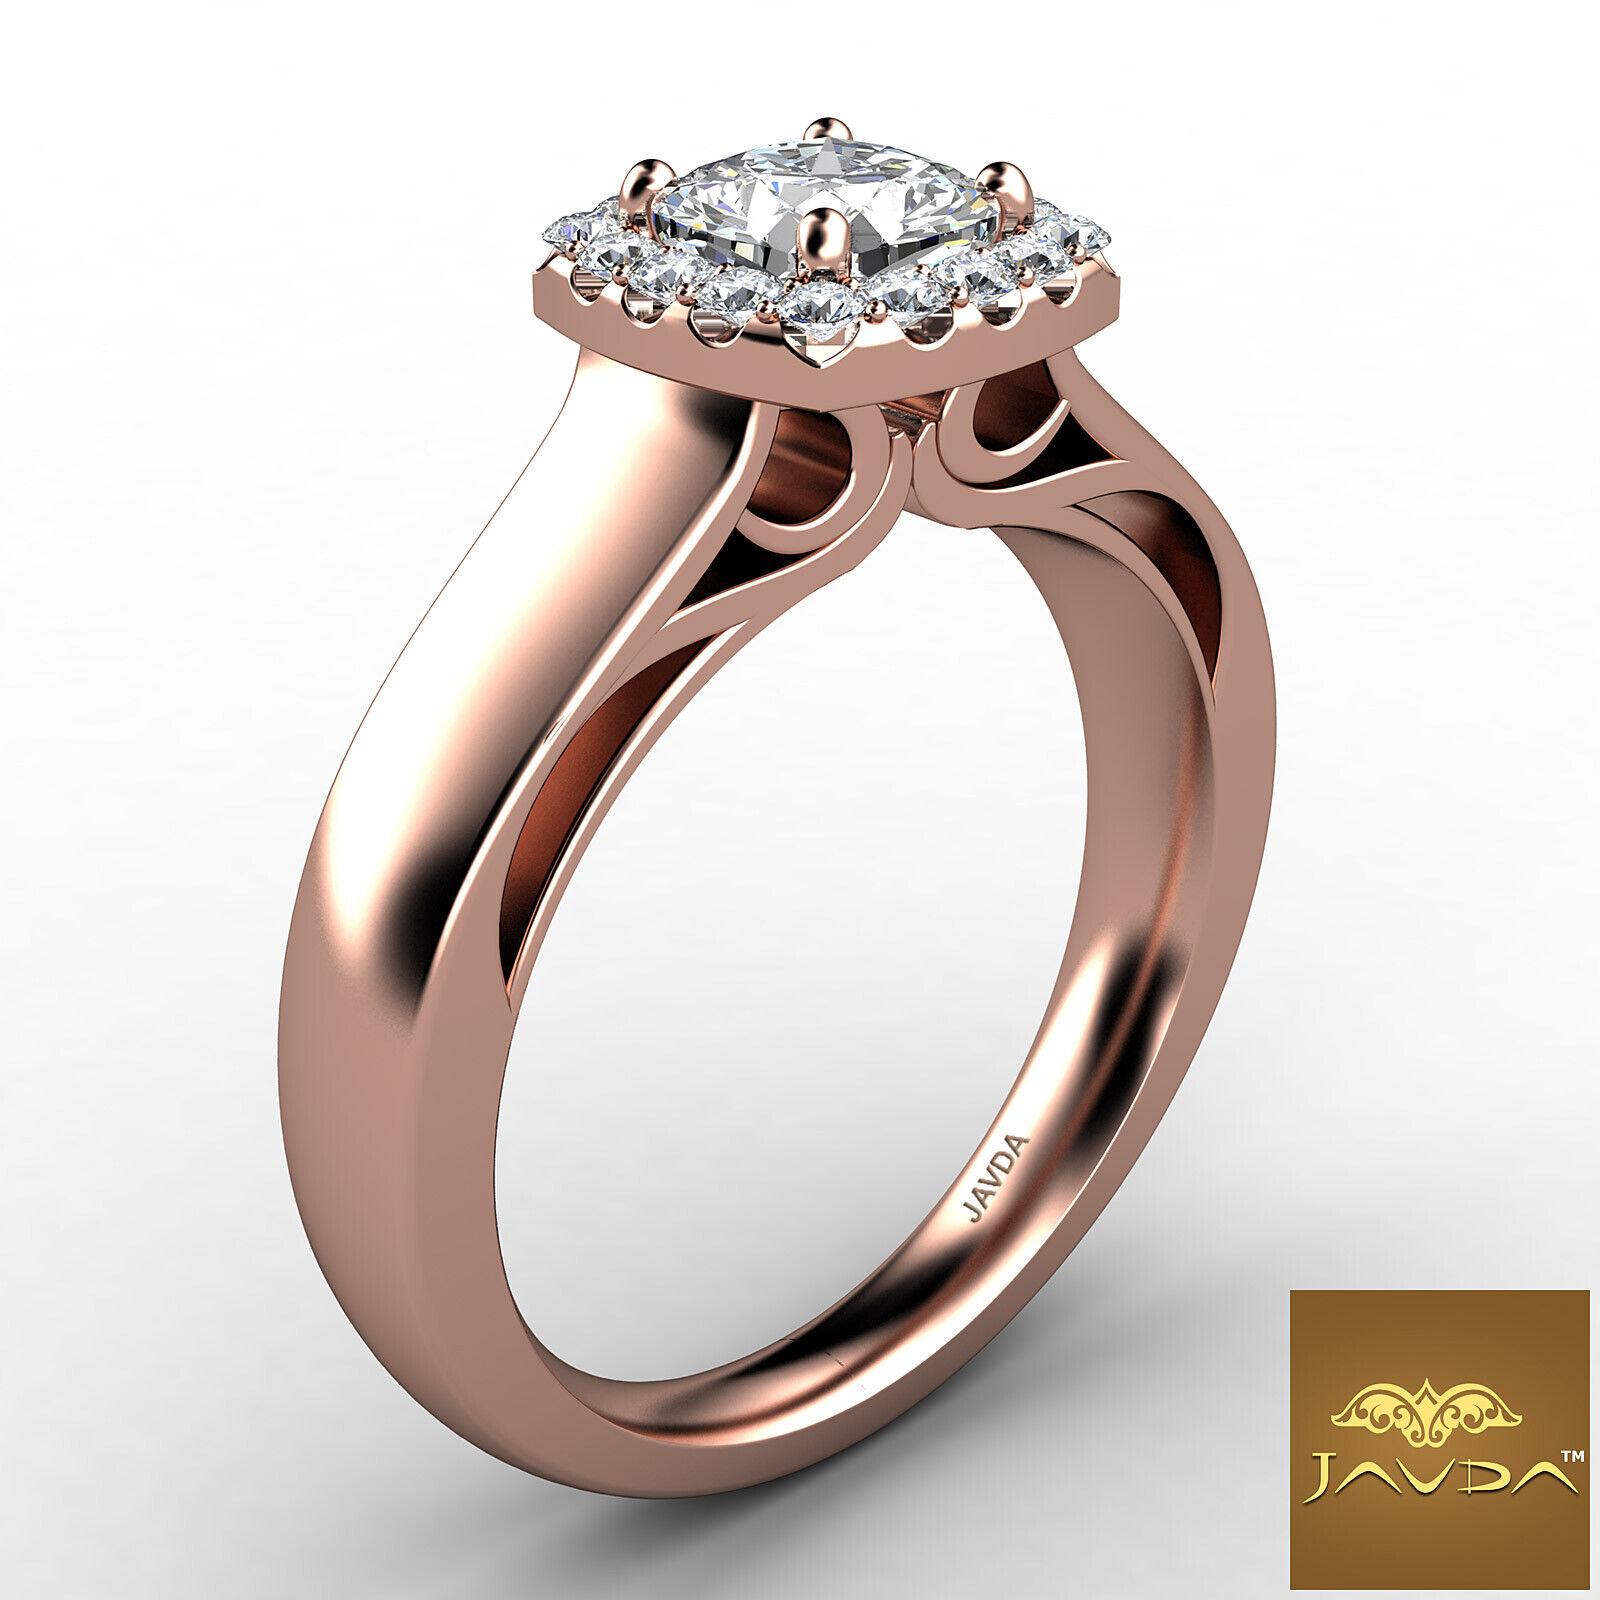 Filigree Shank U Cut Prong Cushion Diamond Engagement GIA H Color VS1 Ring 0.7Ct 10